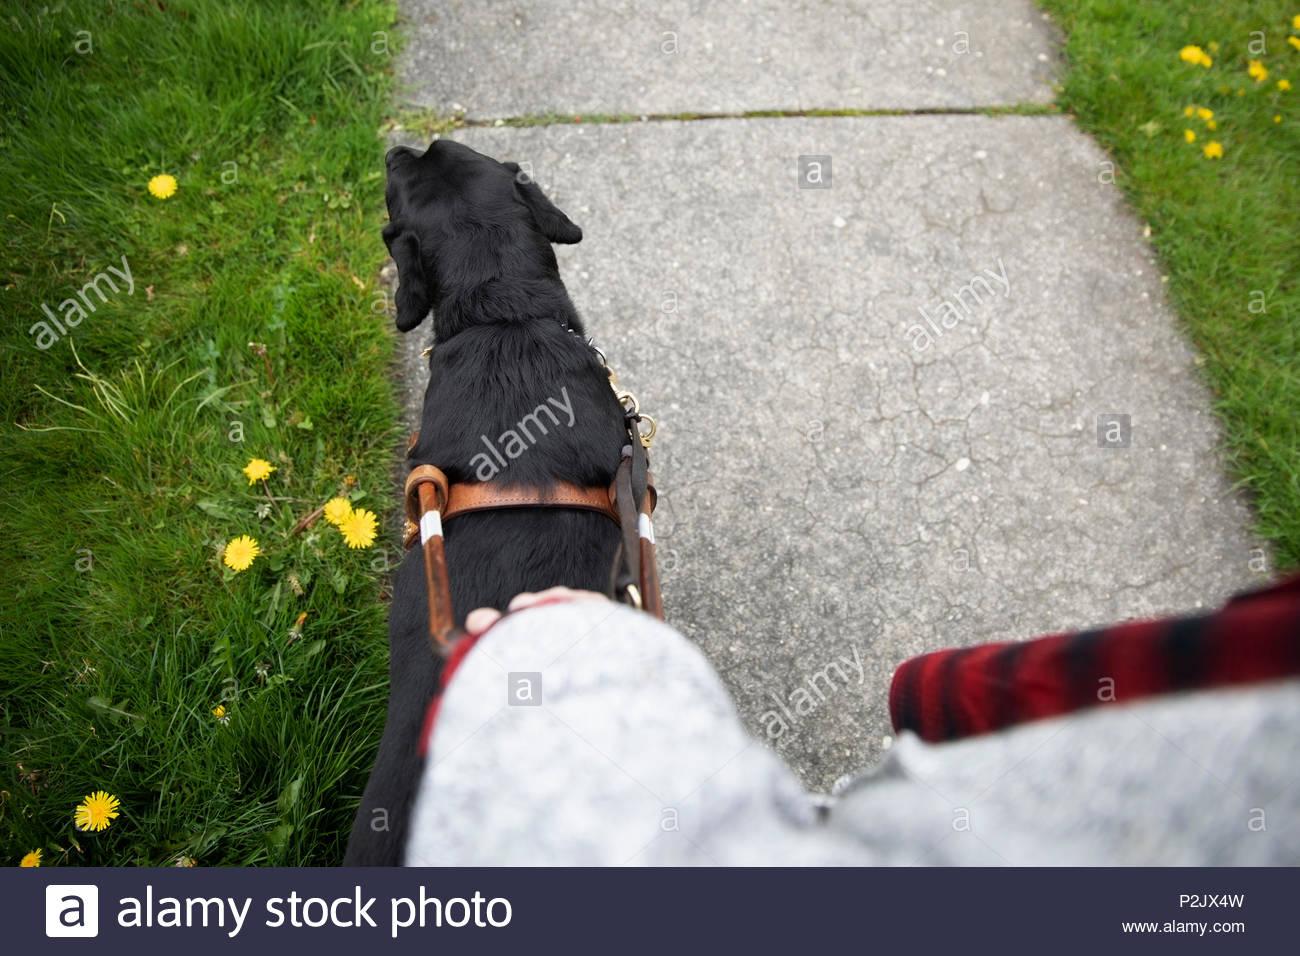 Seeing eye dog leading visually impaired woman walking on sidewalk - Stock Image